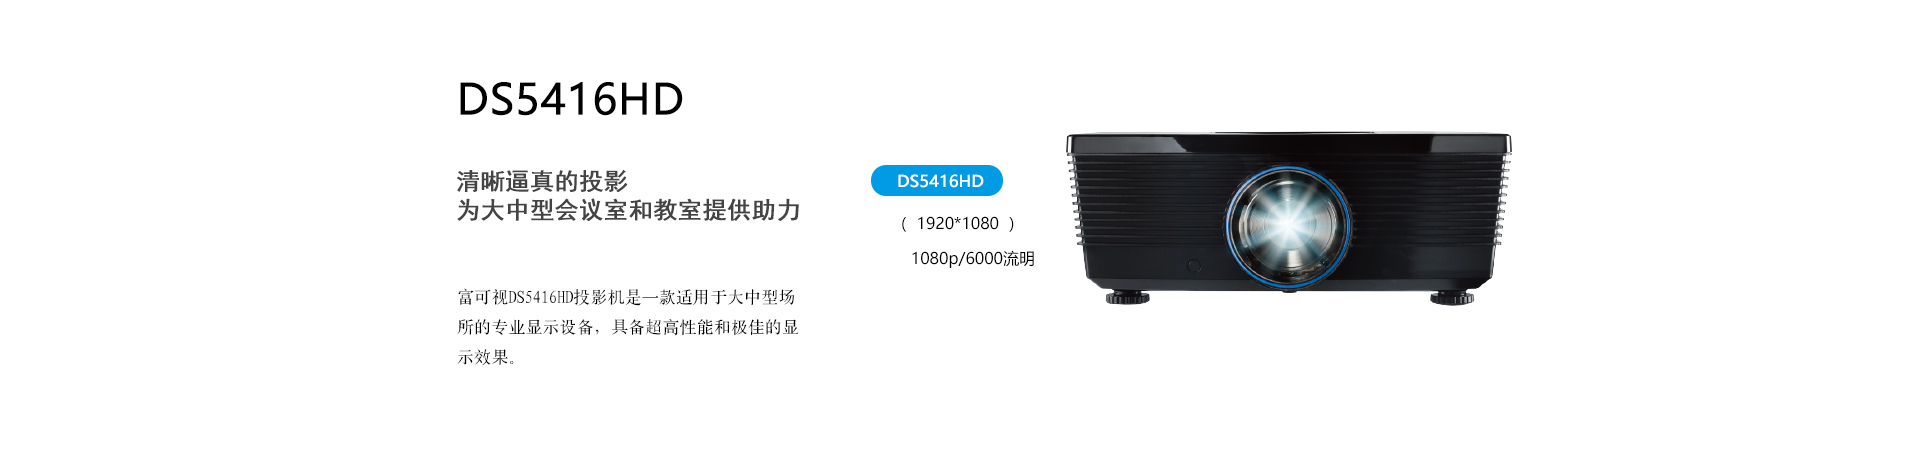 DS5416HD